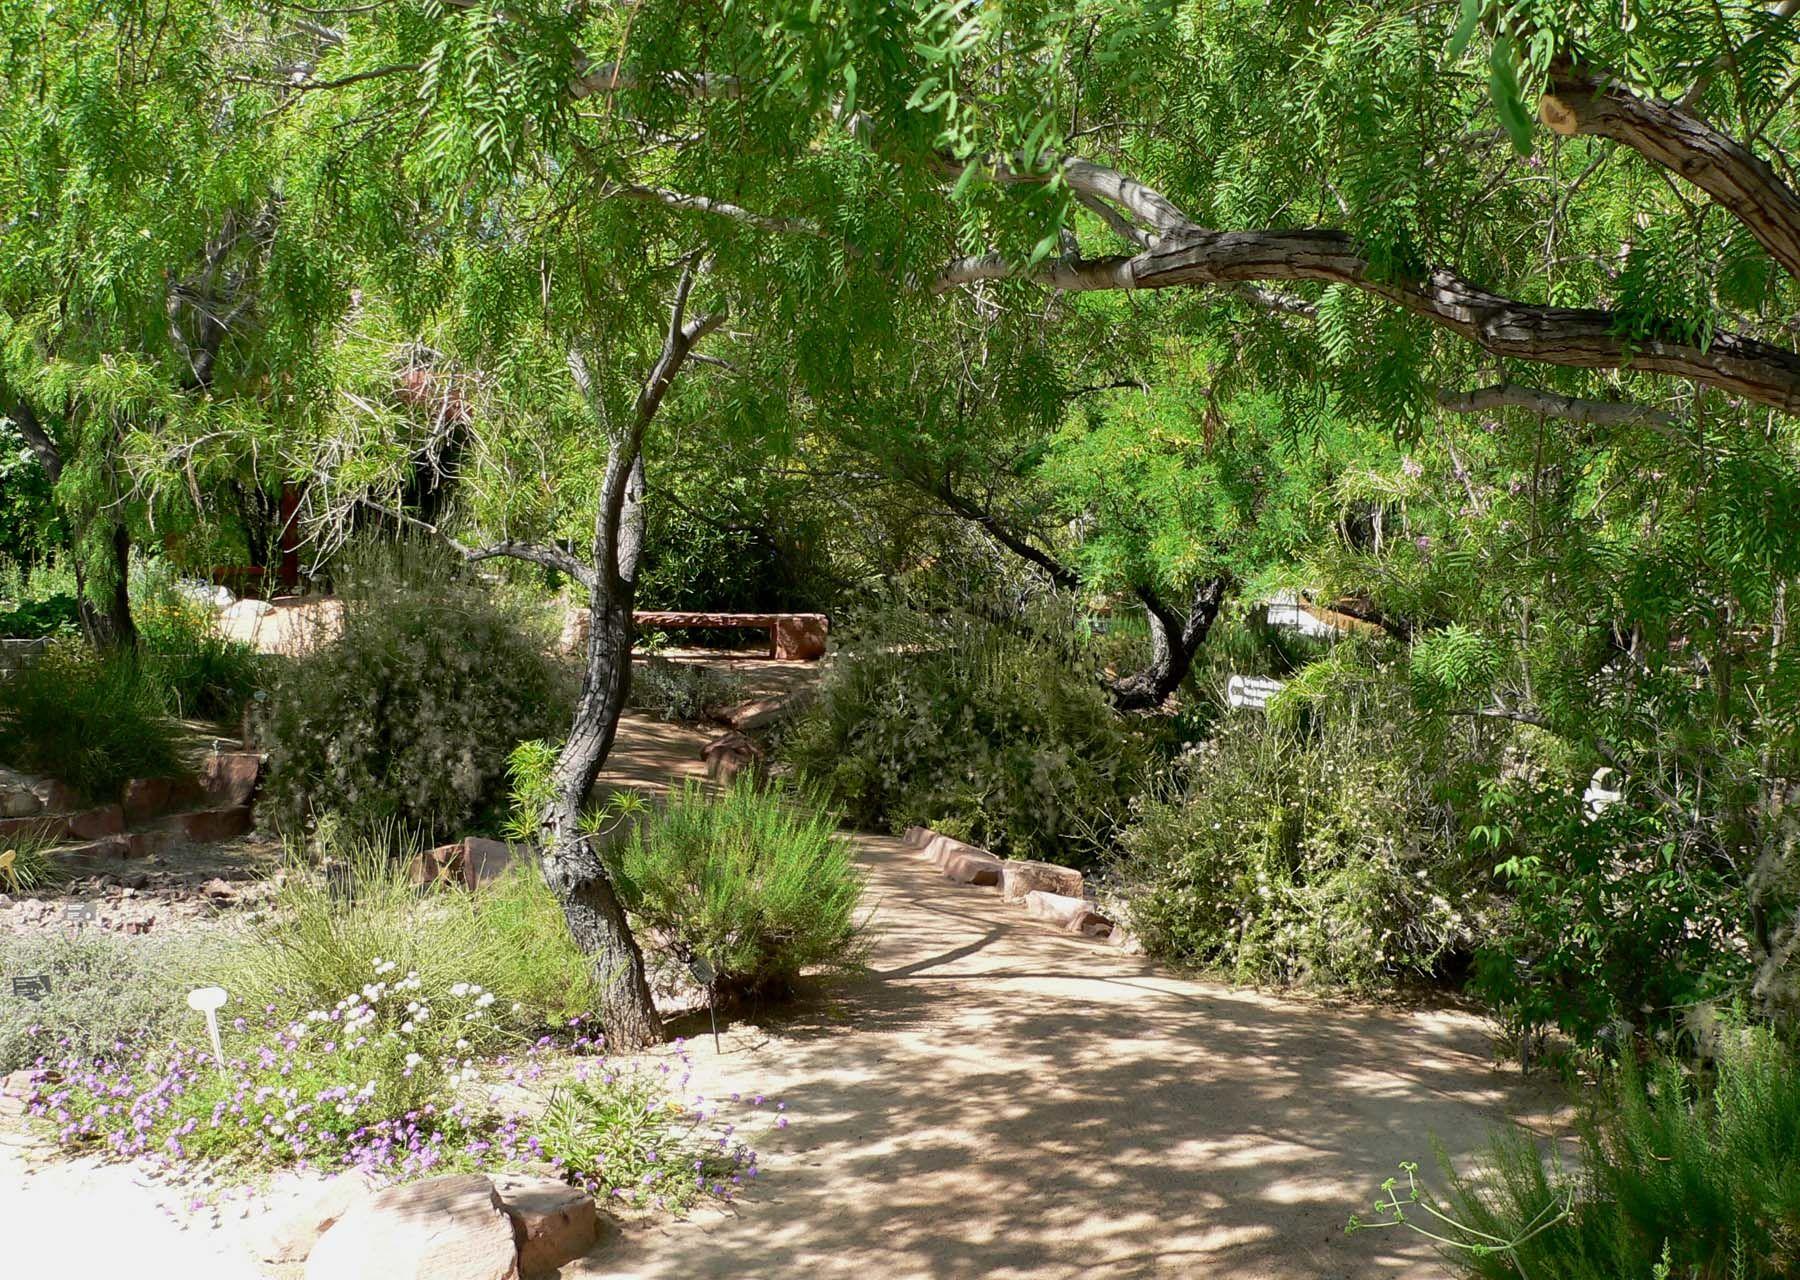 Merveilleux Springs Preserve Garden Path  In The Heart Of Las Vegas